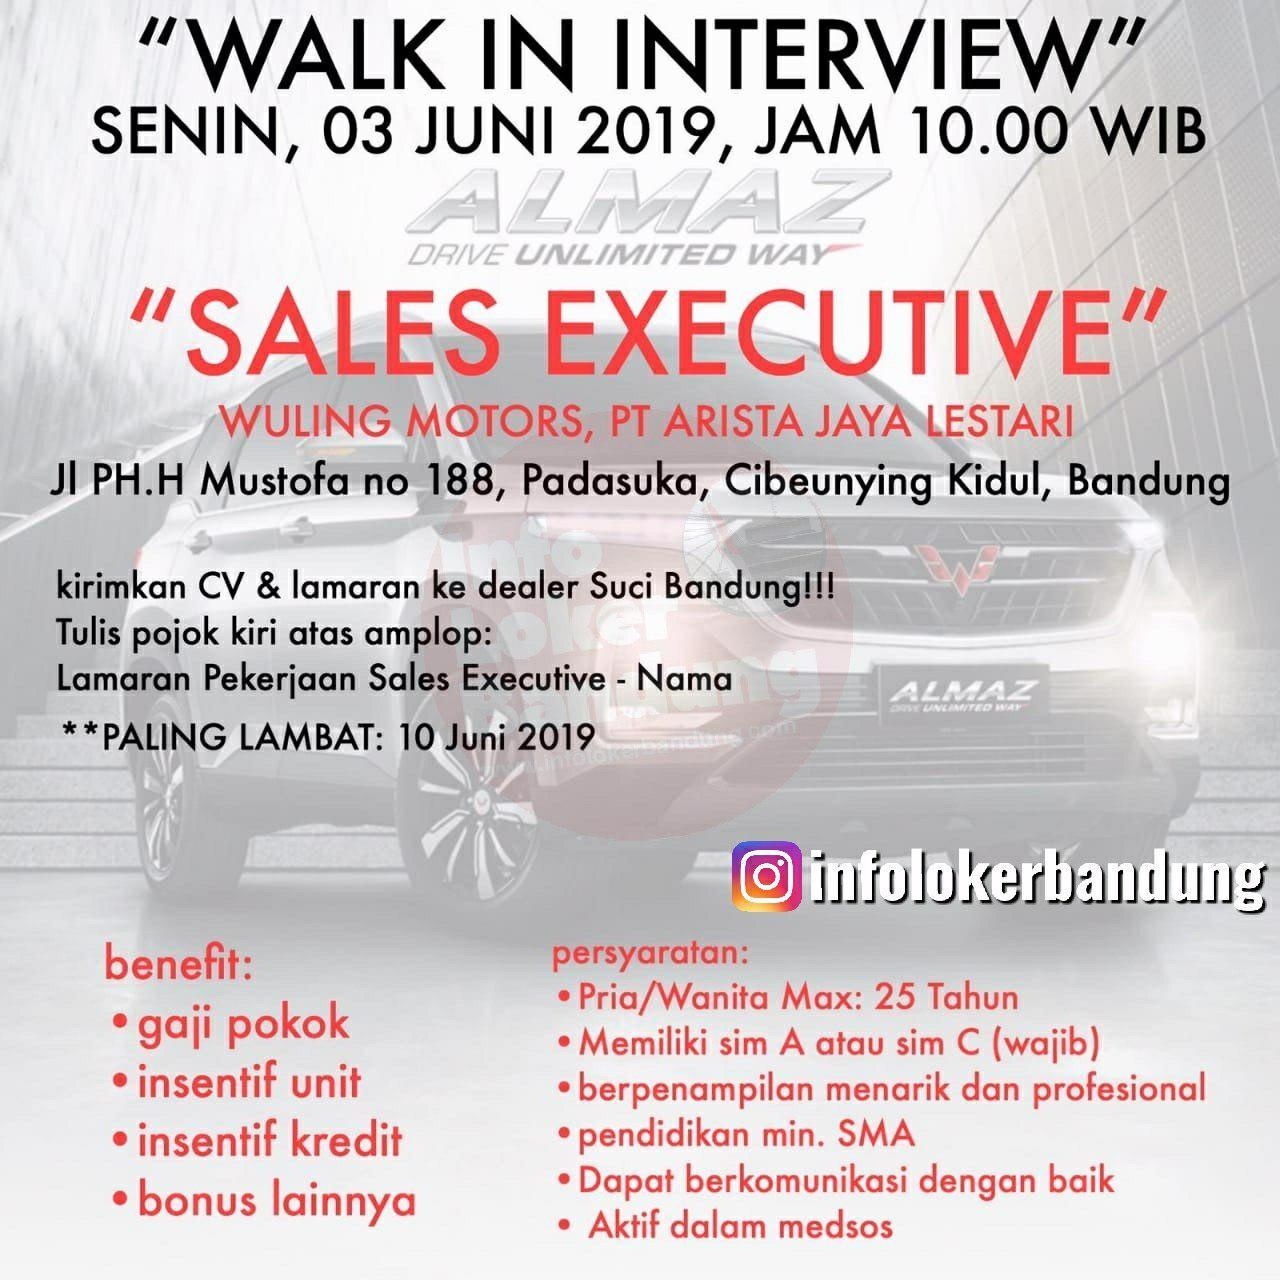 Walk In Interview PT.Arista Jaya Lestari ( Wuling Motors Bandung )  Senin 3 Juni 2019